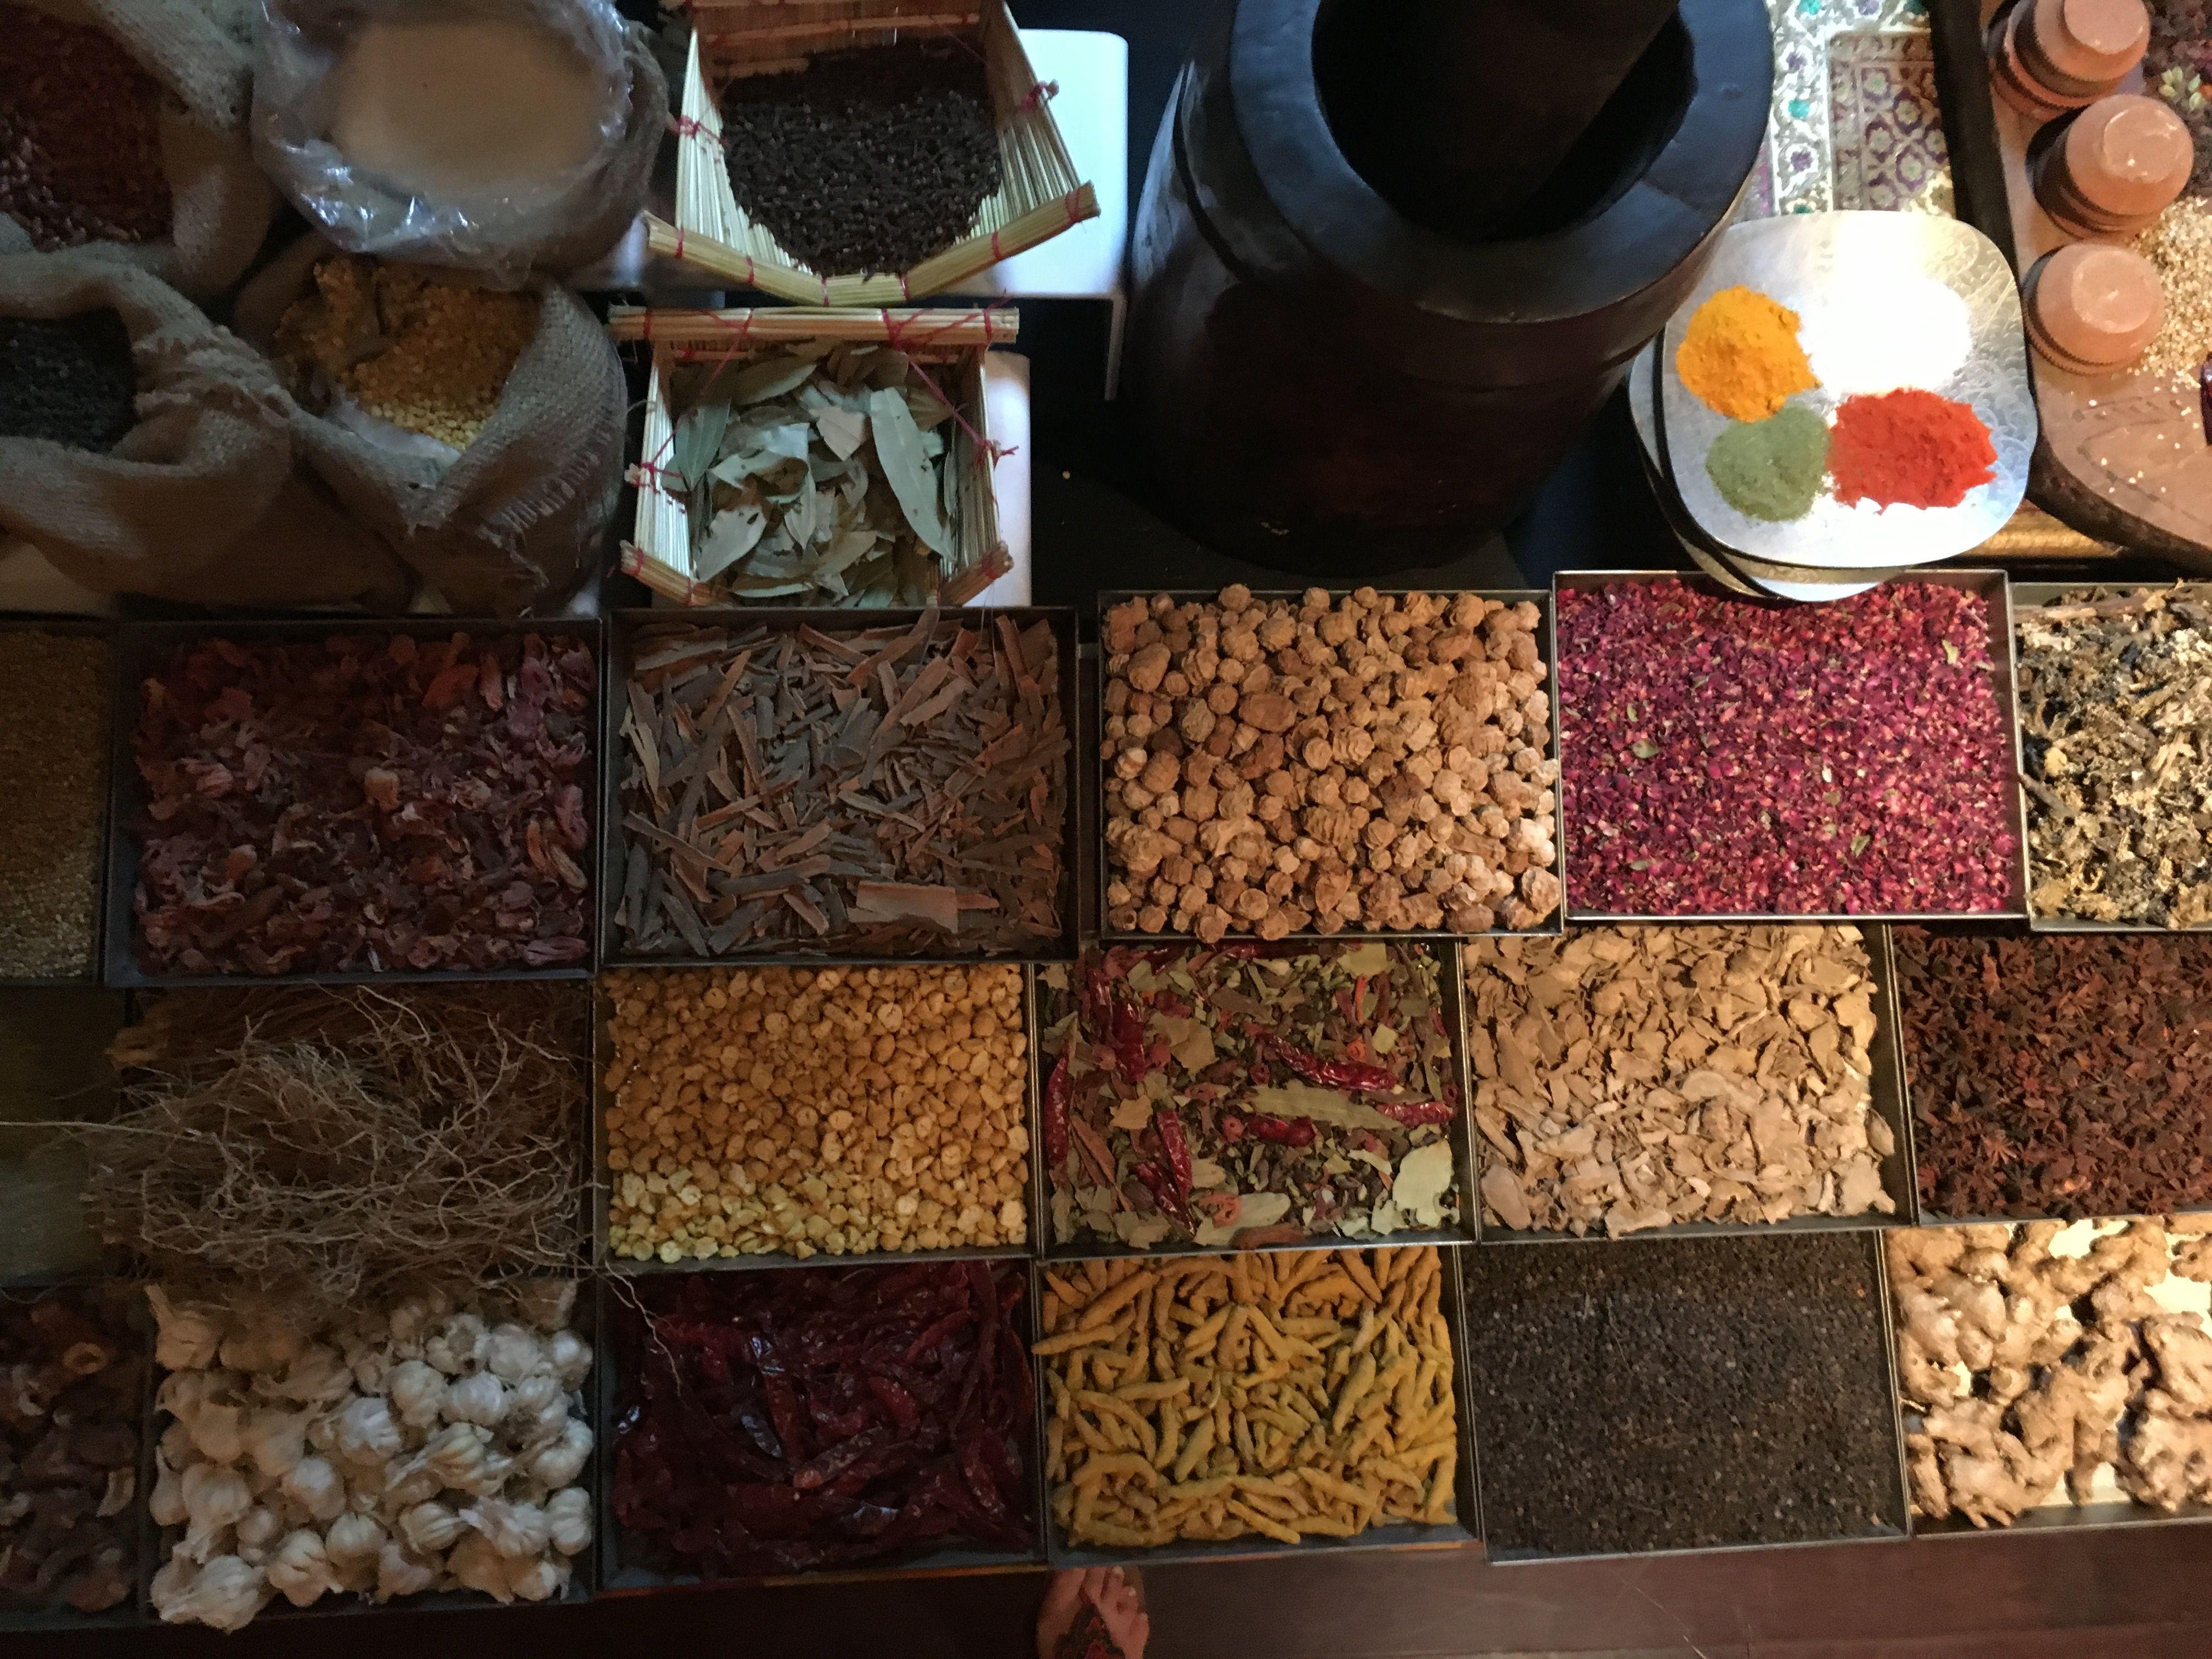 #SuramaJurdi #Índia #Indianfood